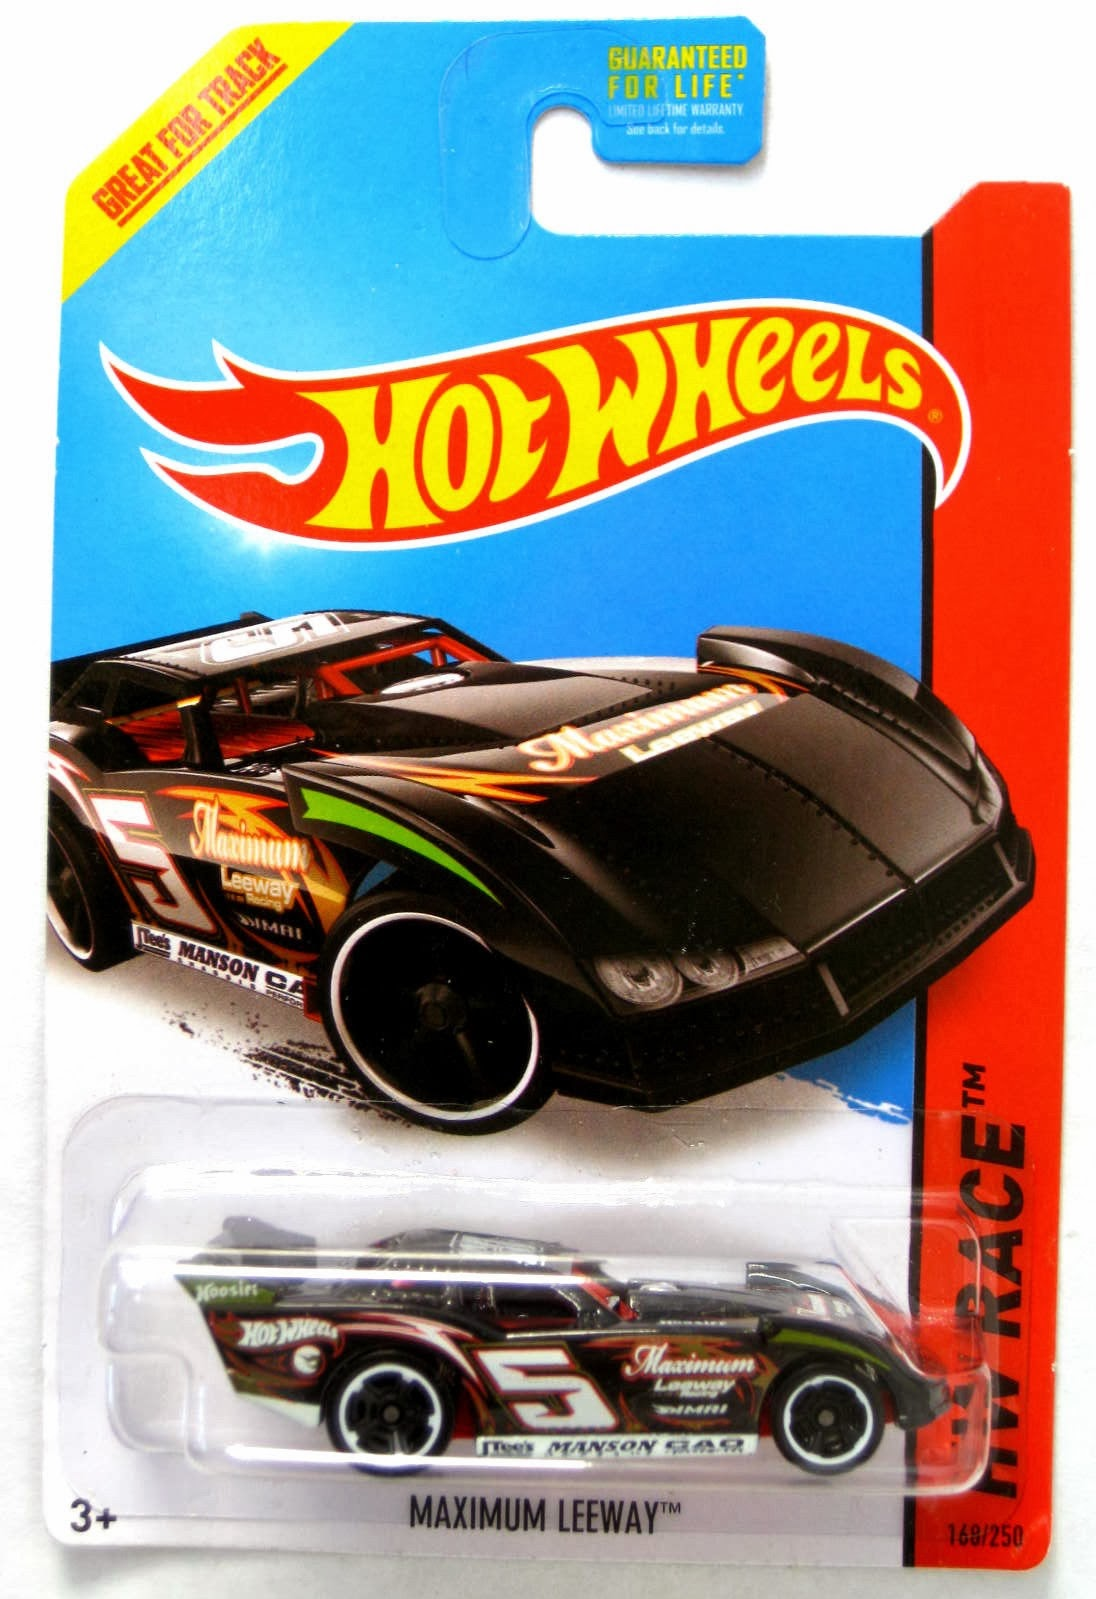 2016 Treasure Hunts Hot Wheels Newsletter | 2016 - 2017 Best Cars ...